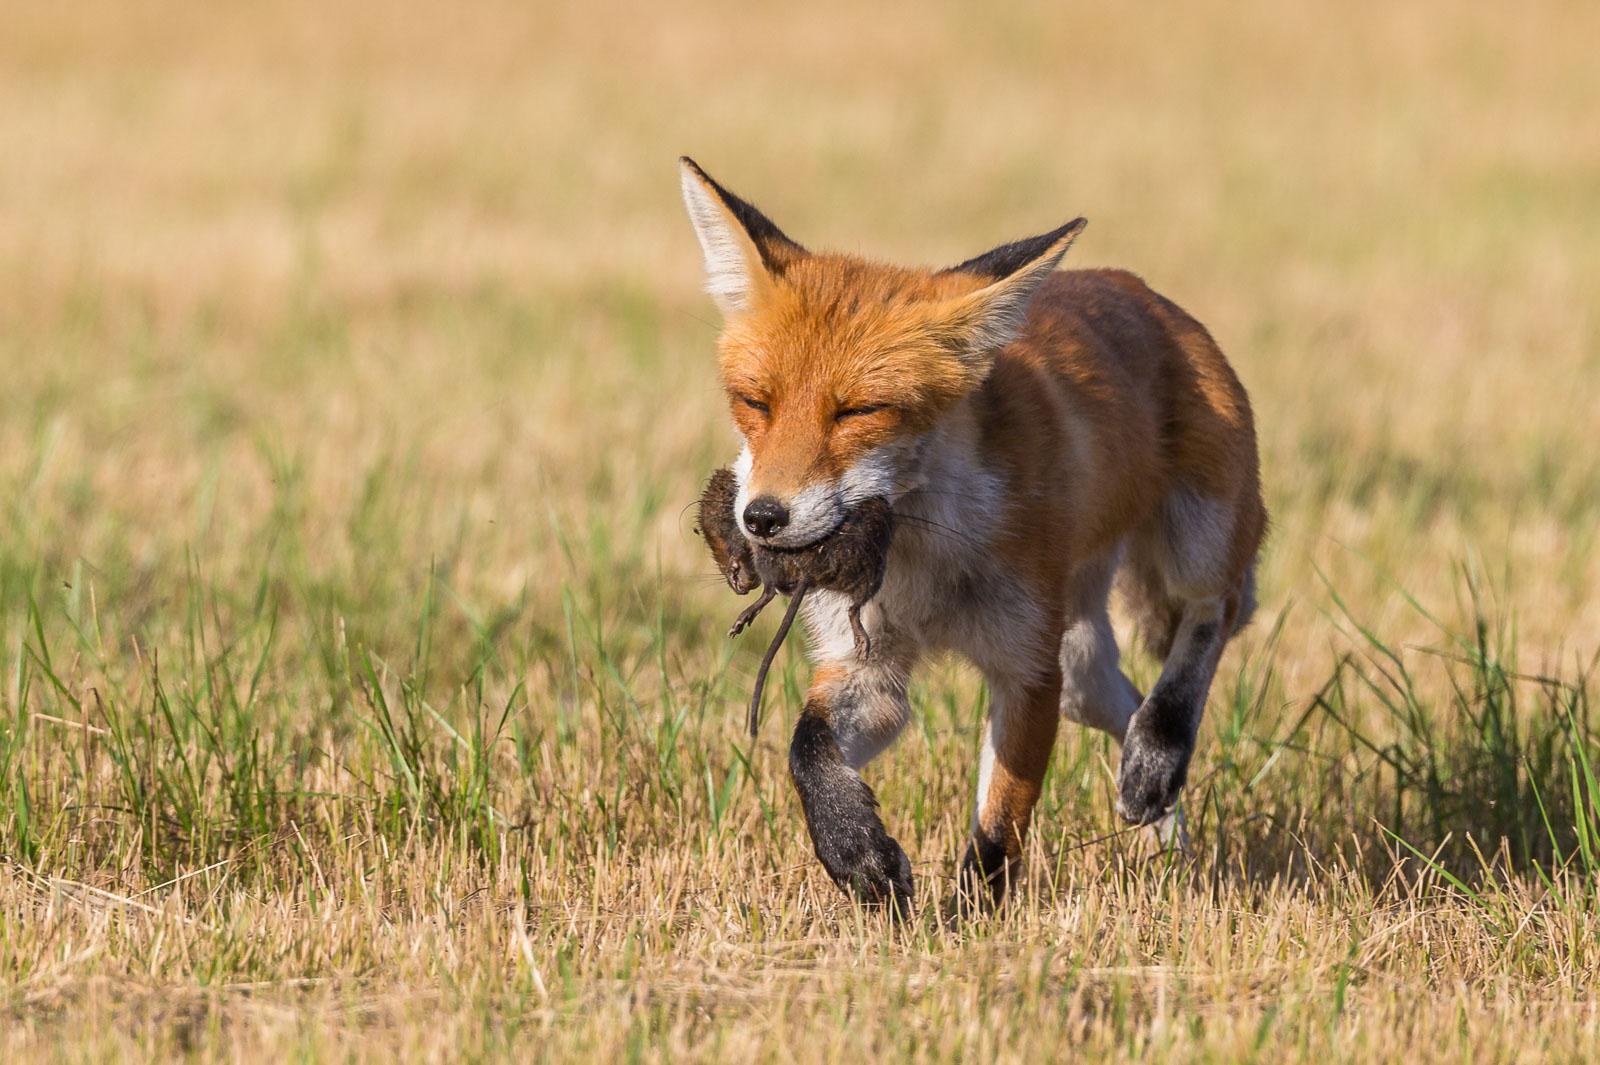 Kisande räv med sork i munnen